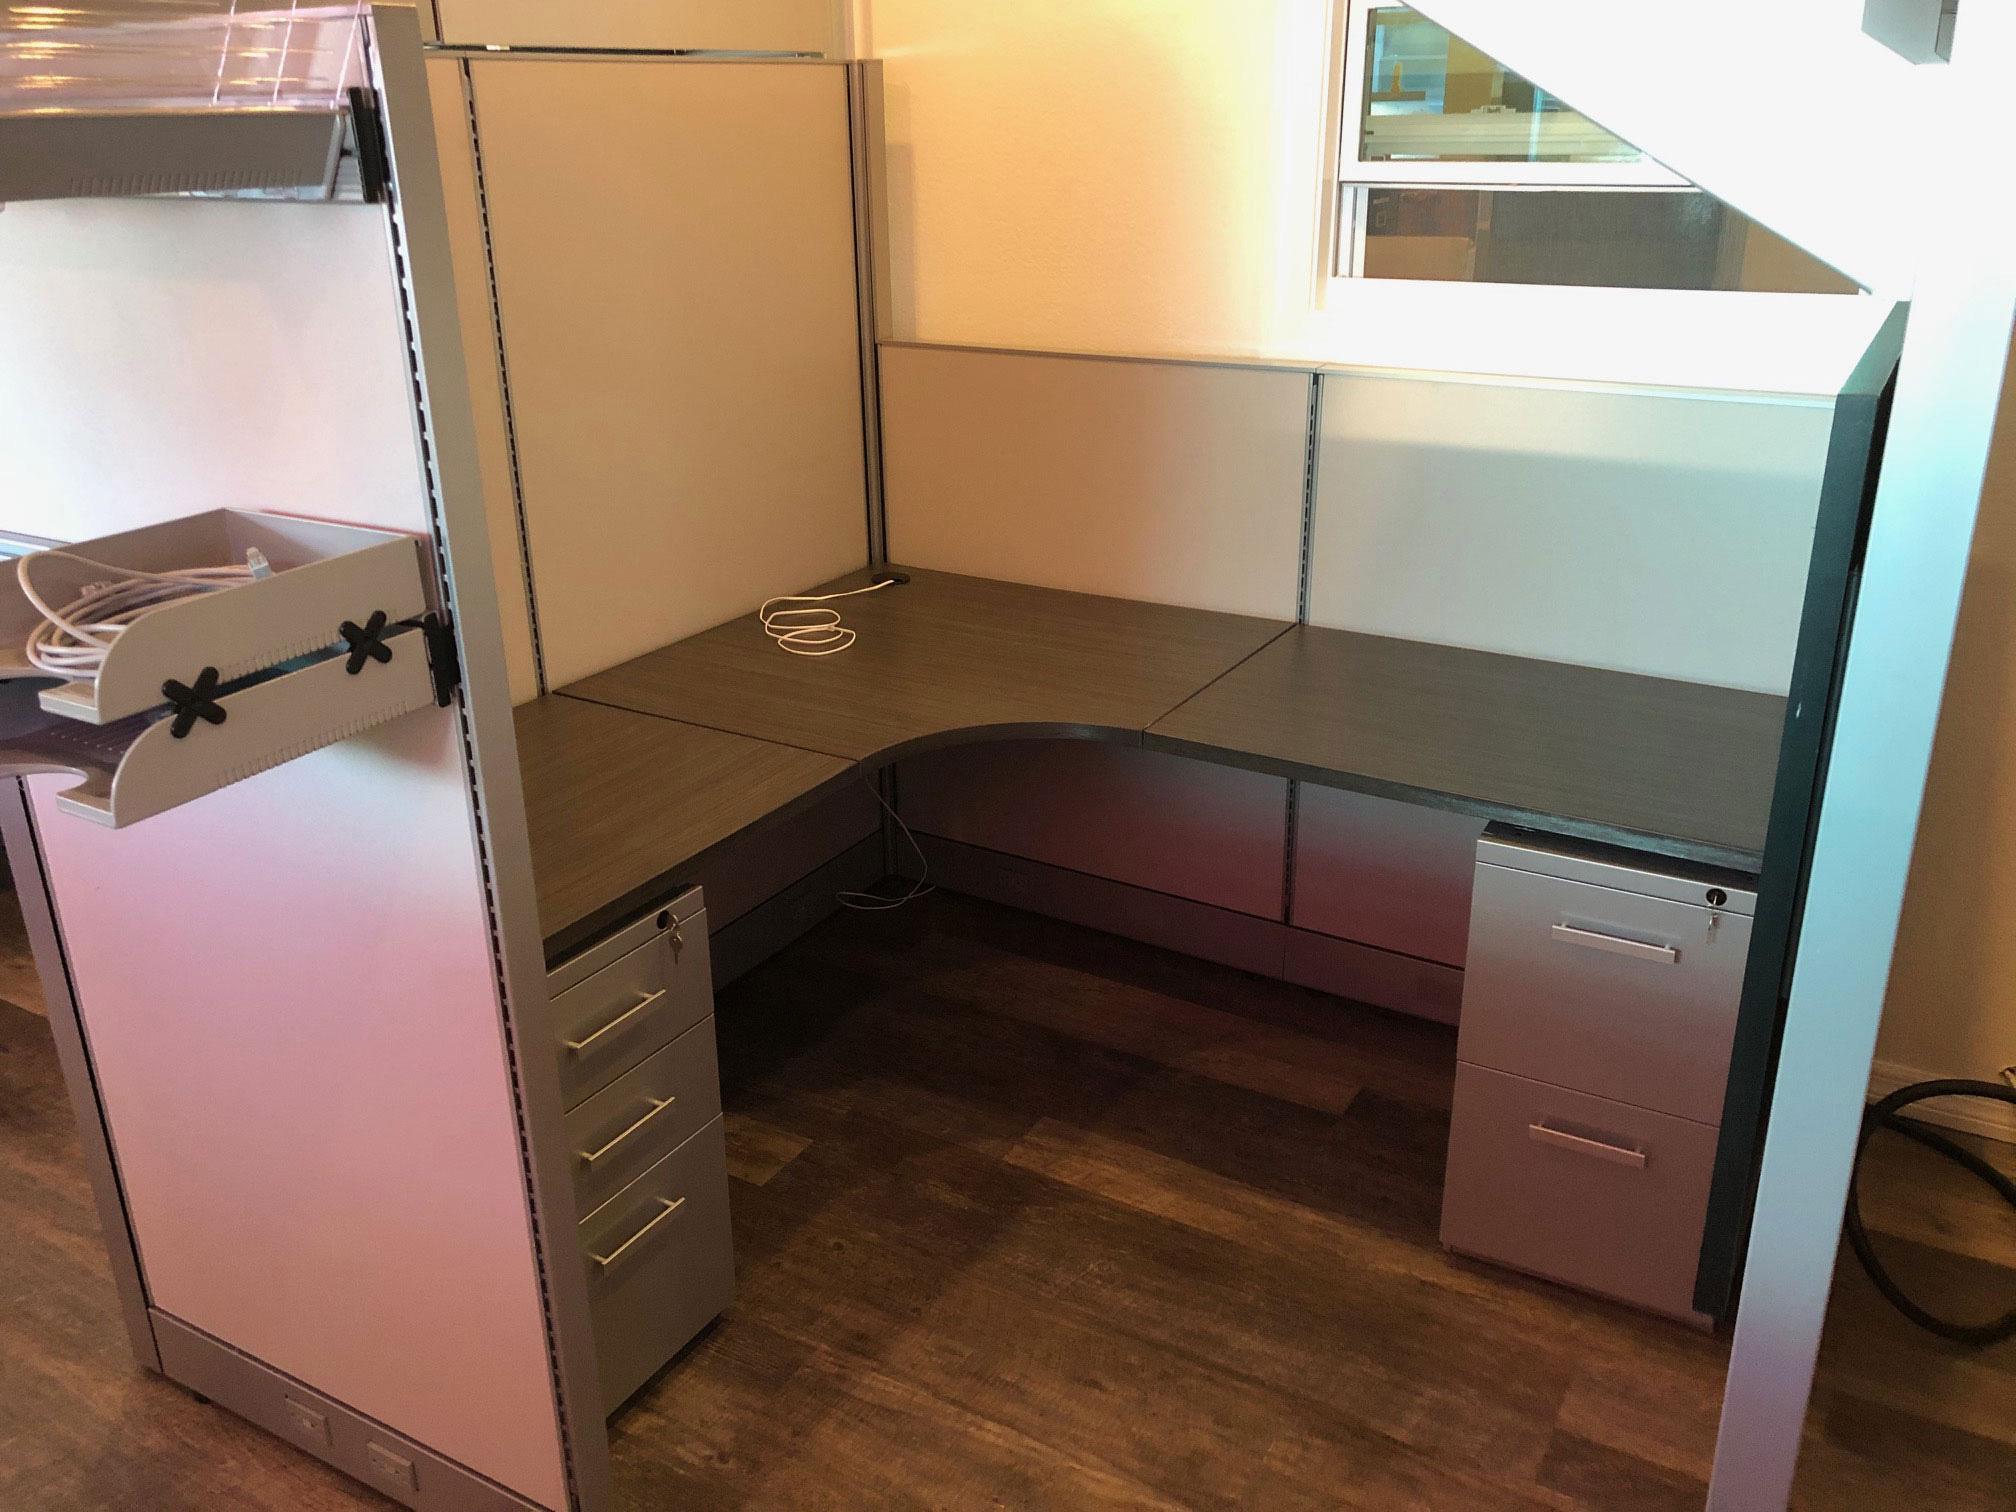 office-cubicles-for-sale-in-bradenton-florida-2.jpg